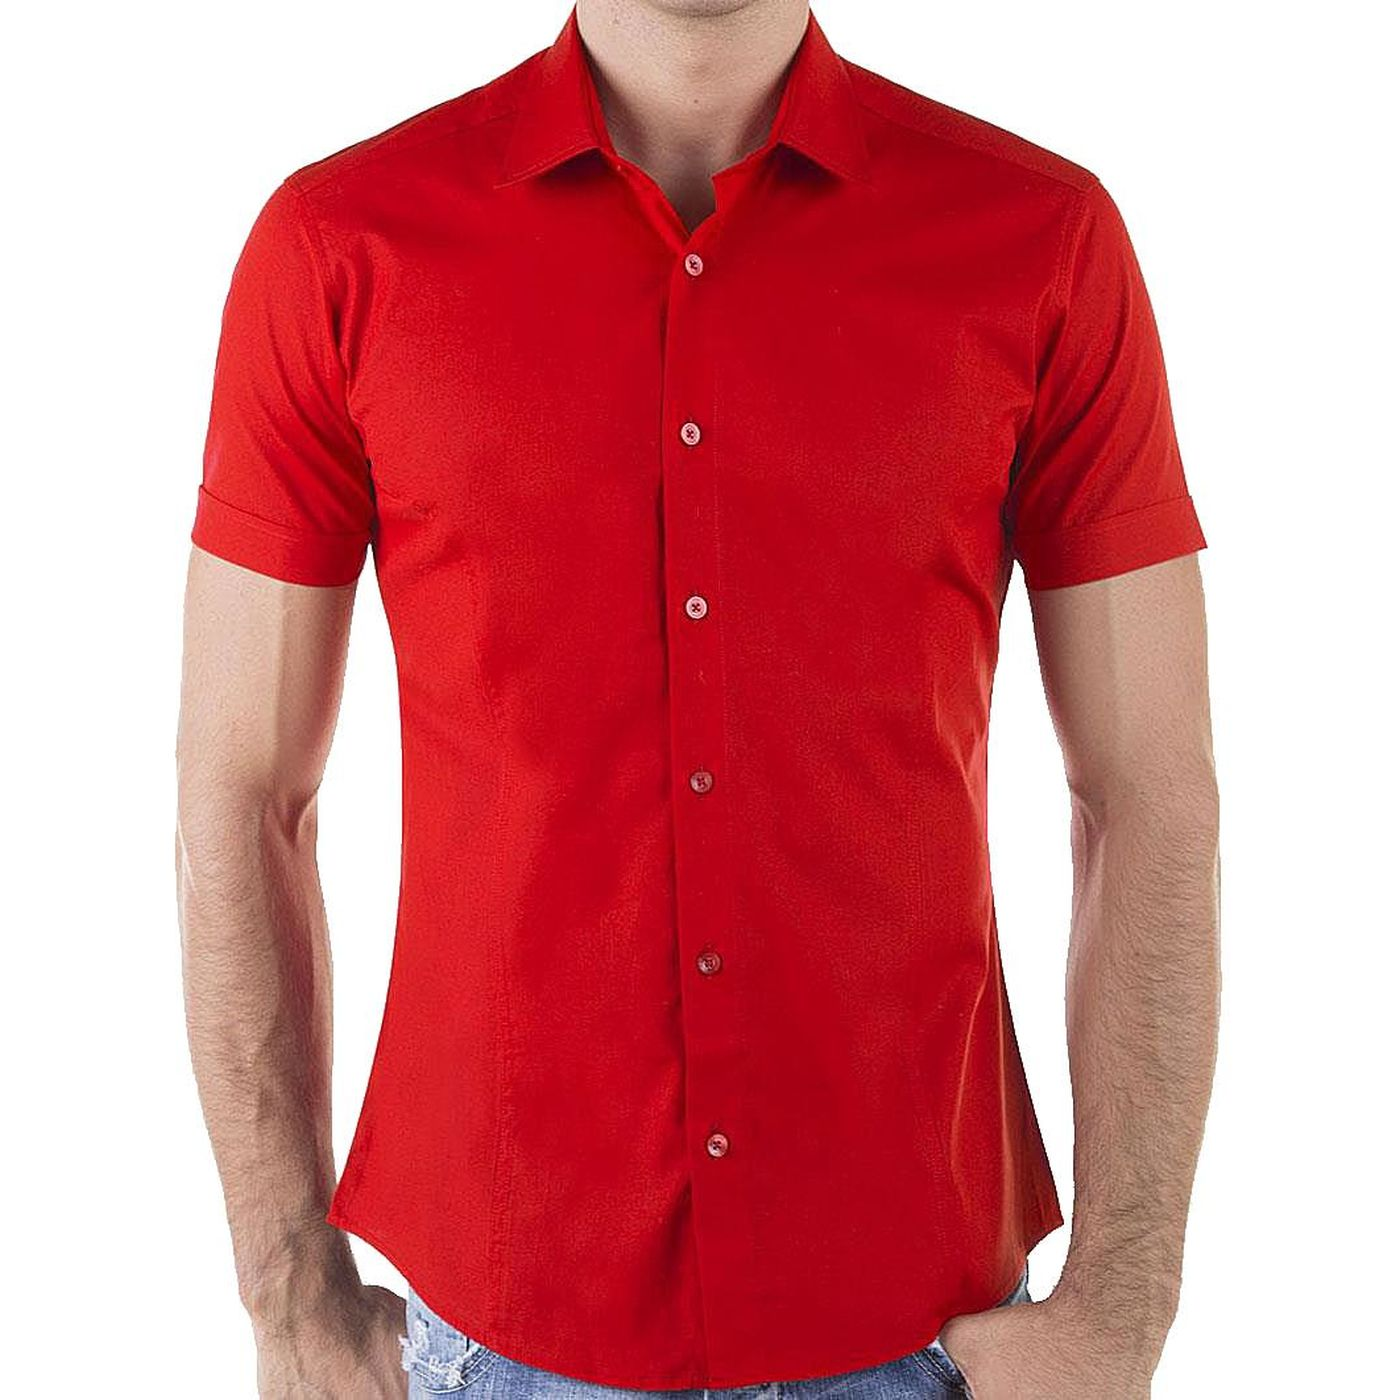 buy popular e6c52 625b2 redbridgejeans.de